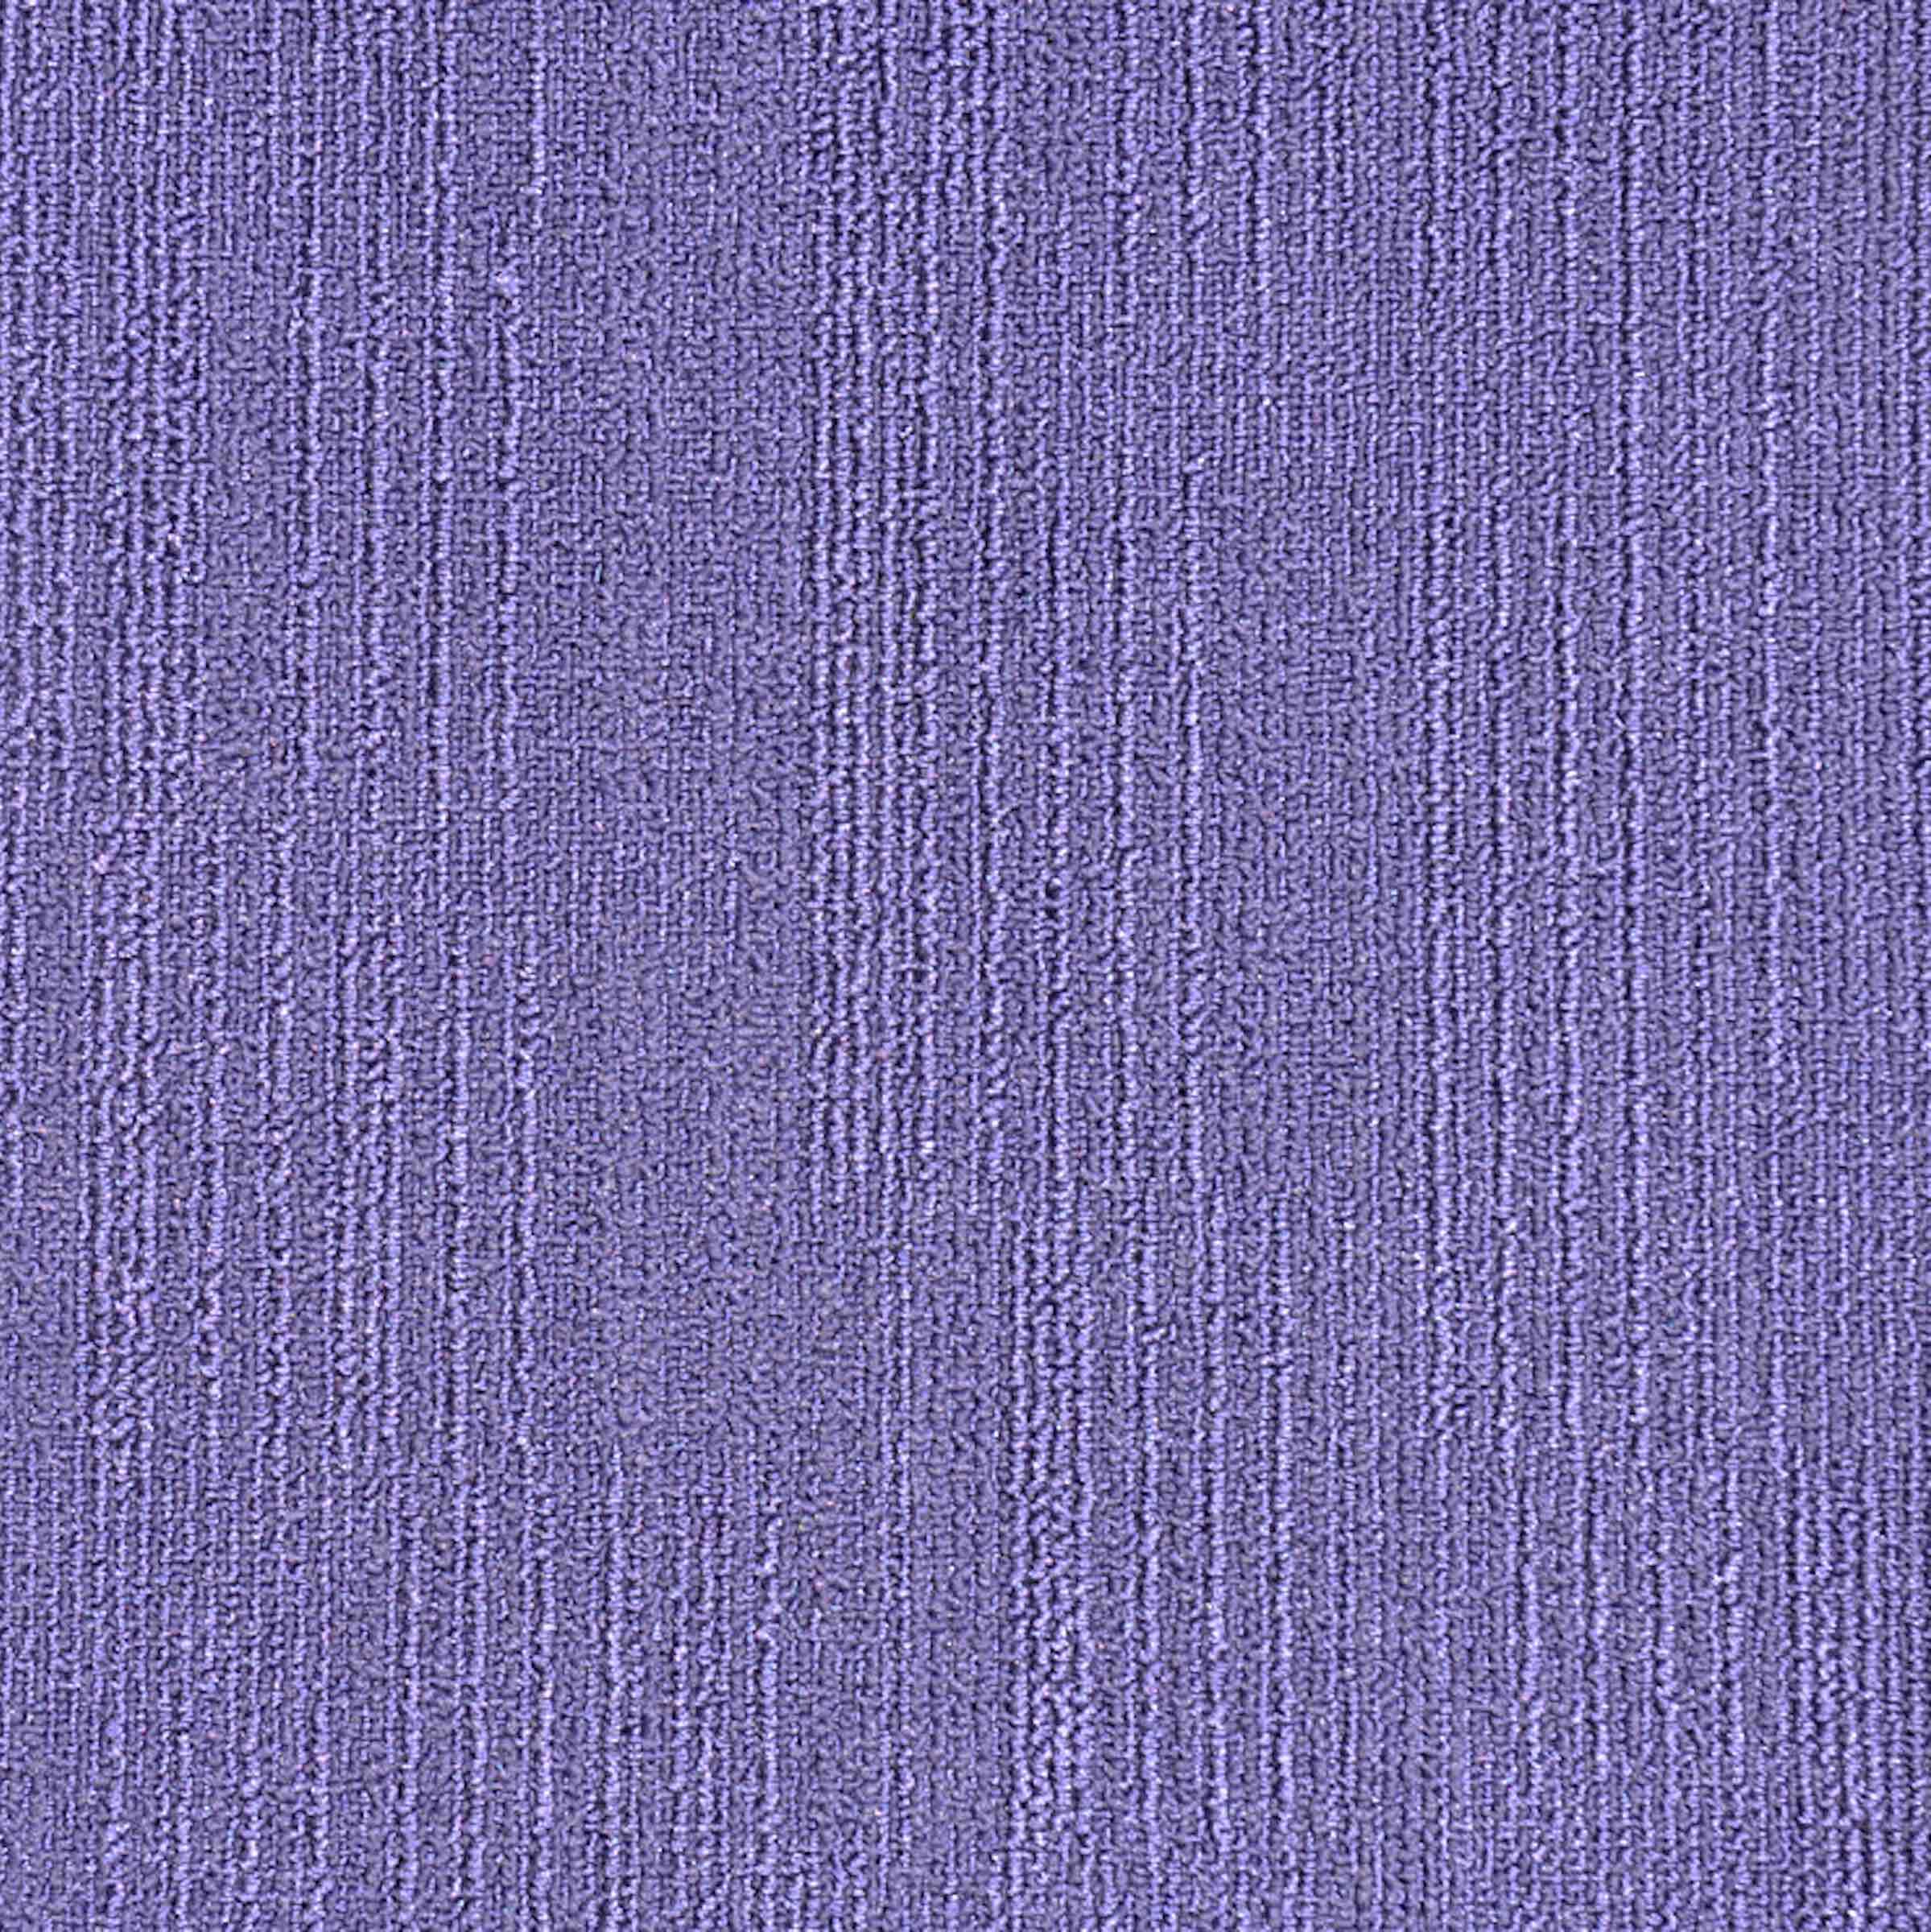 Highlights 3 Multi-Level | 74823 | Paragon Carpet Tiles | Commercial Carpet Tiles